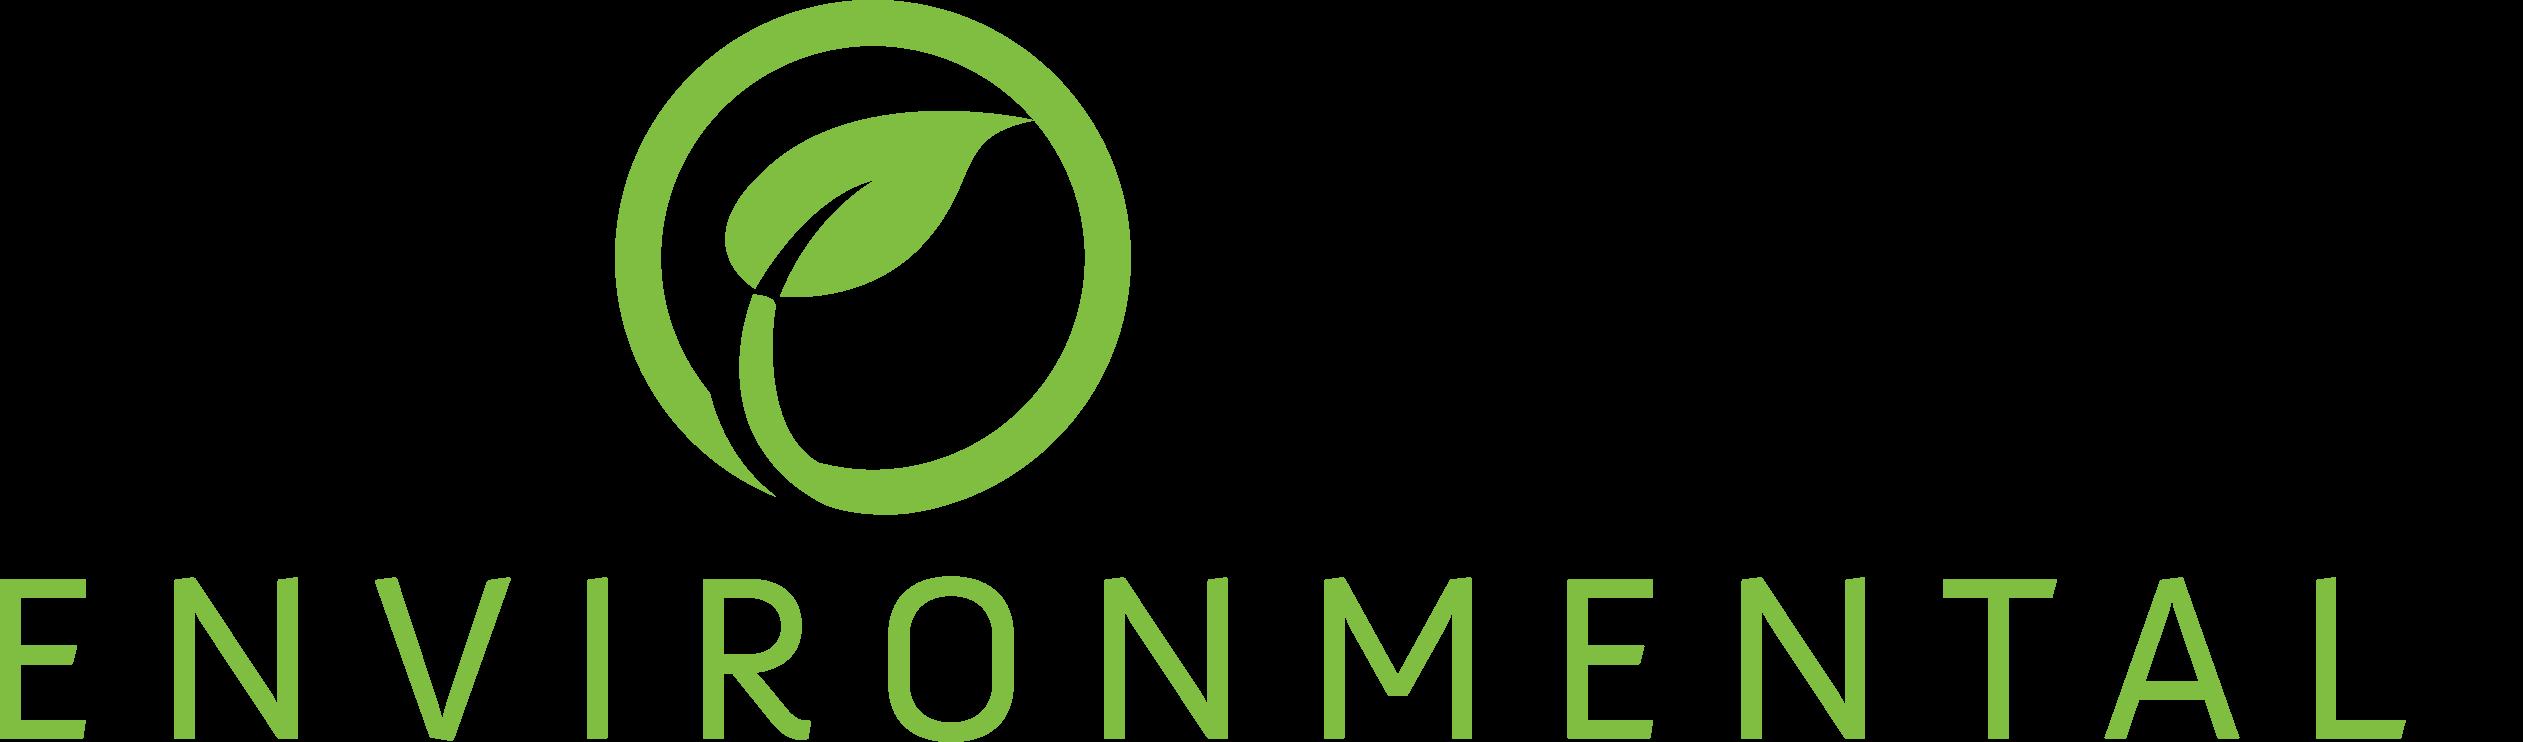 cropped-Protect-Environmental-Logo.png